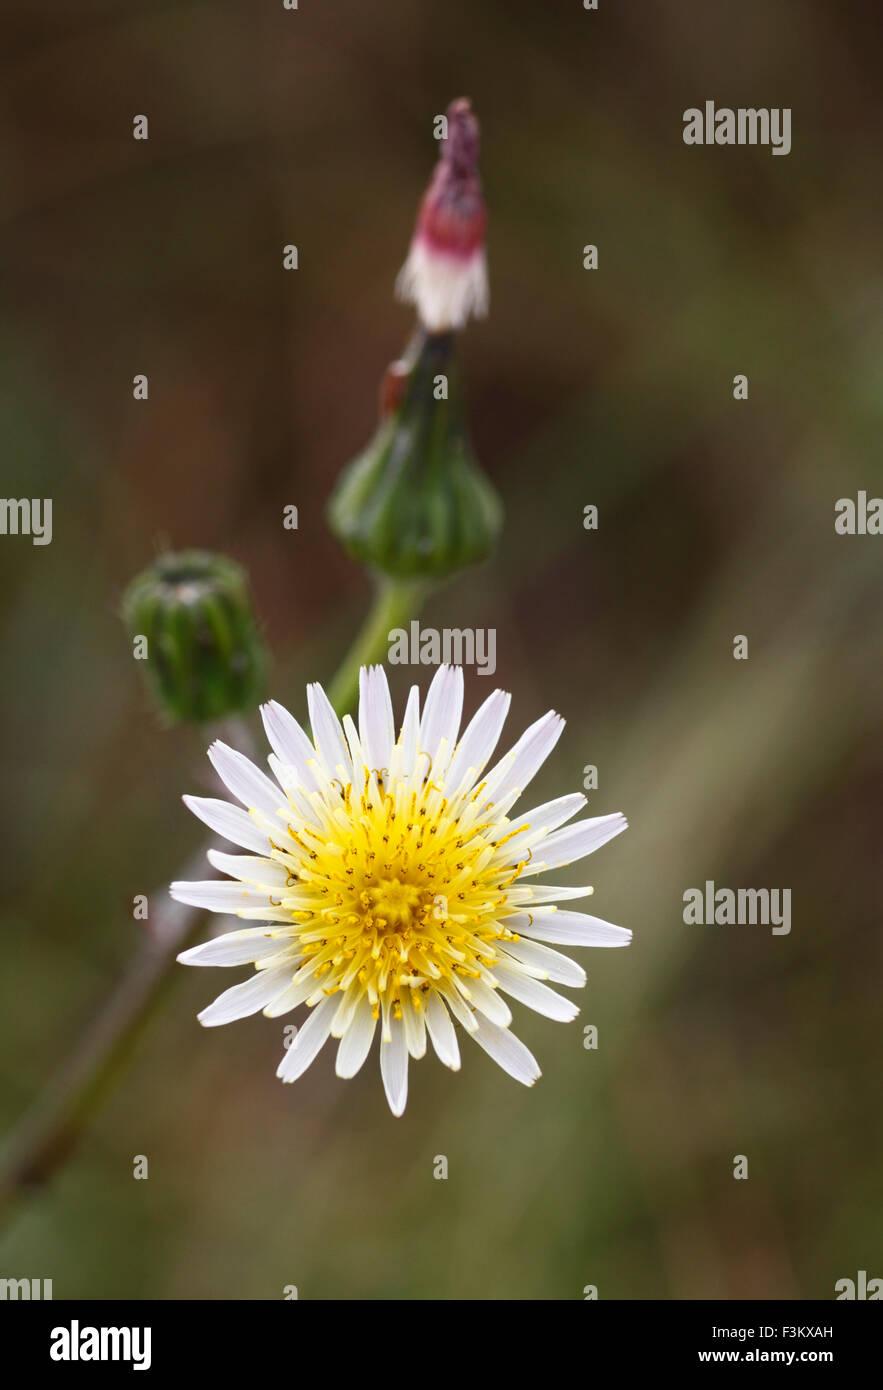 wildflower-F3KXAH.jpg